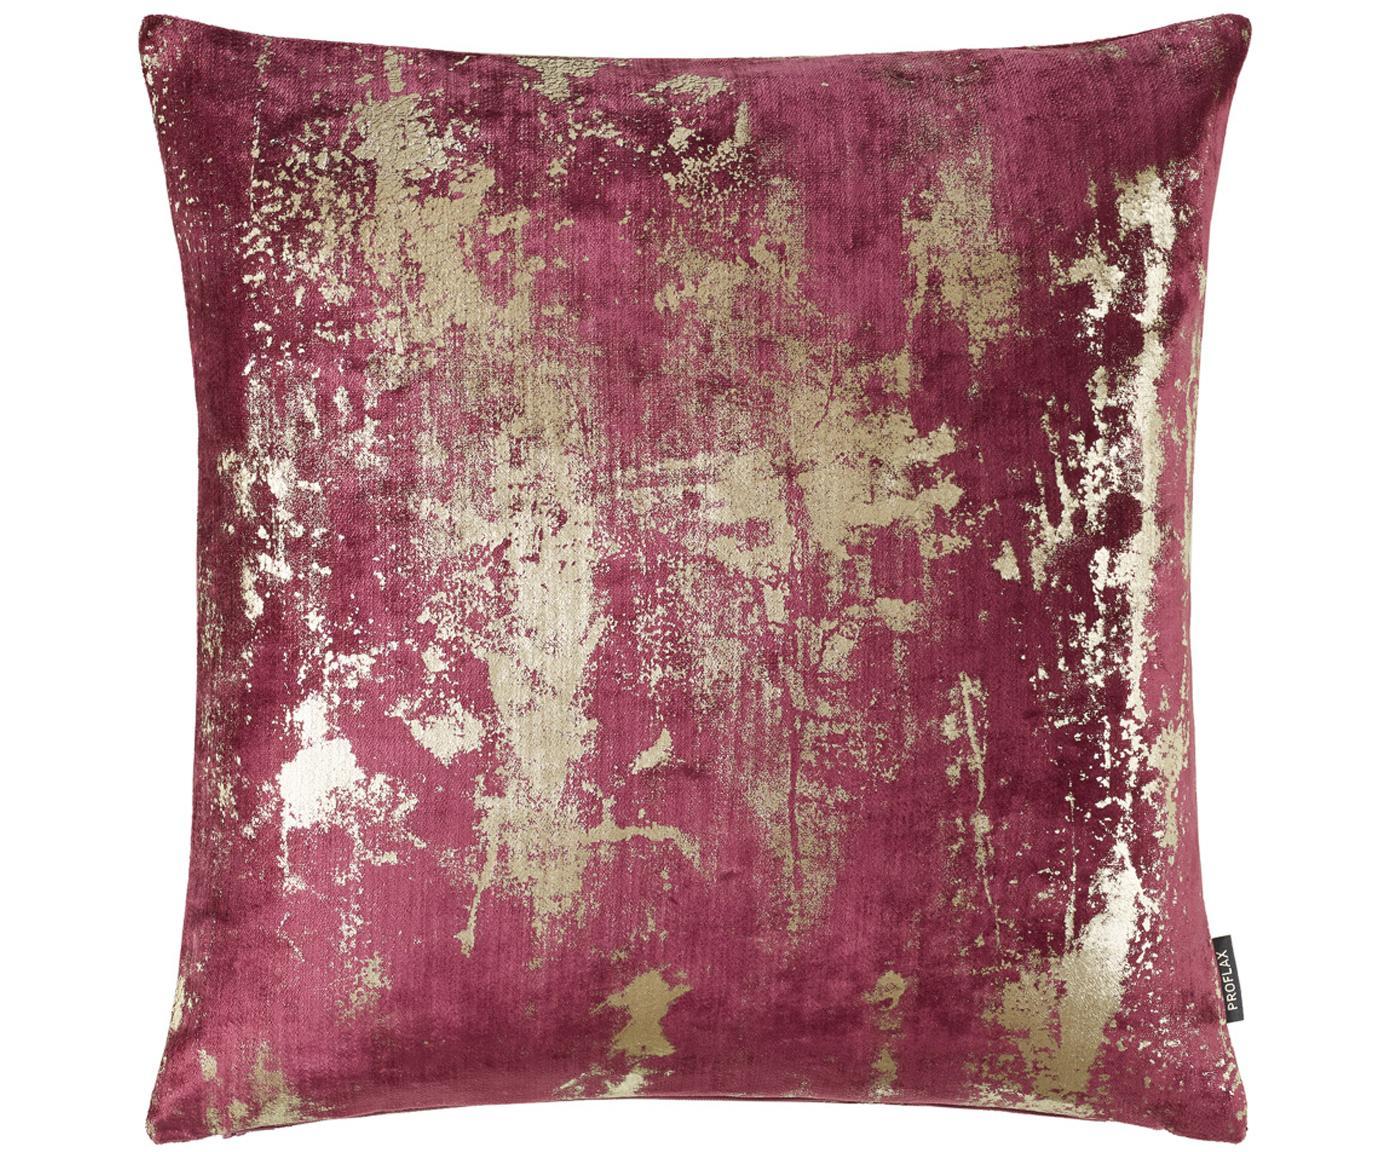 Samt-Kissenhülle Shiny mit schimmerndem Vintage Muster, 100% Polyestersamt, Weinrot, 40 x 40 cm